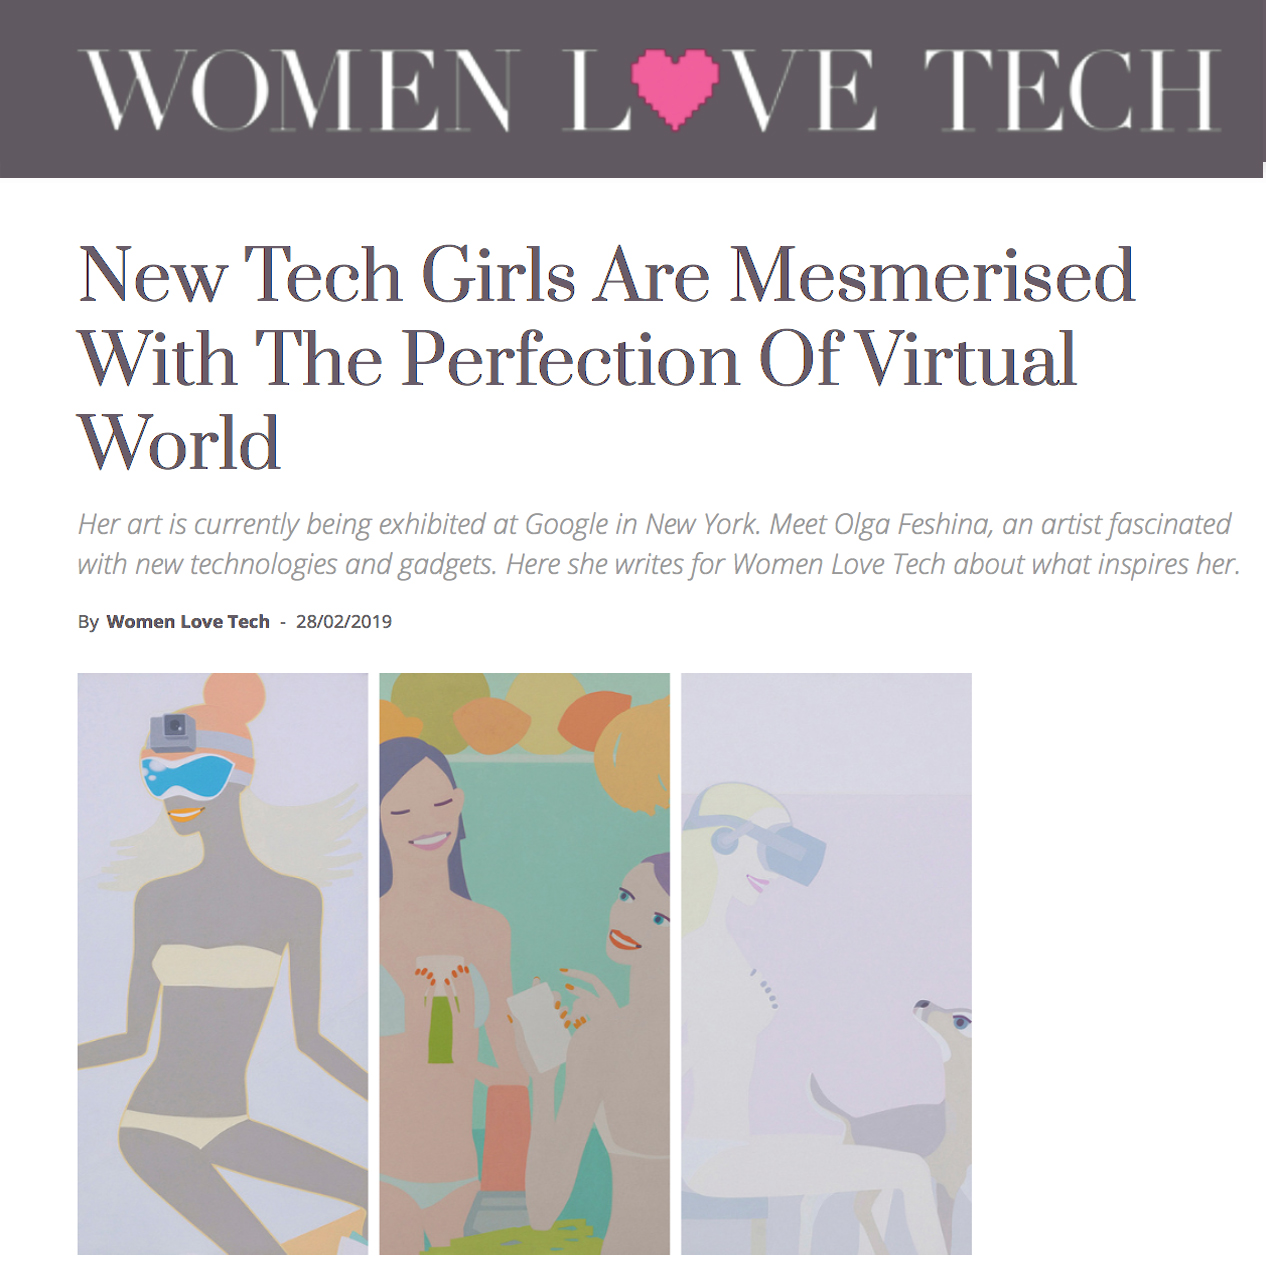 Women Love Tech